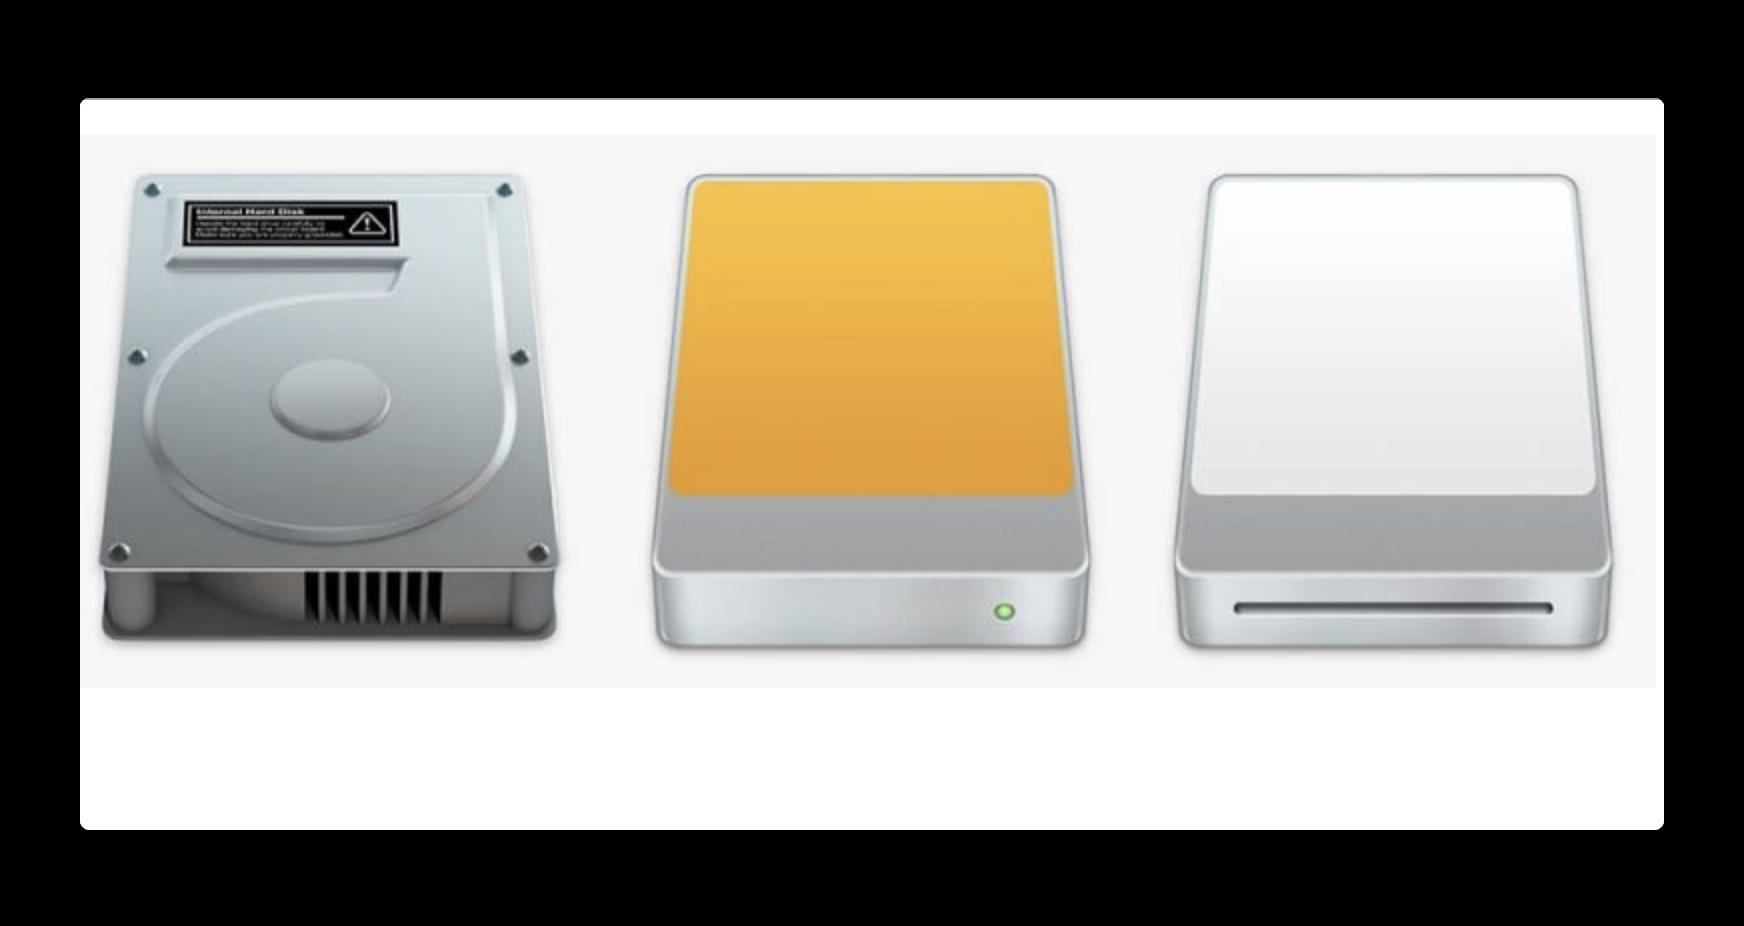 macOSHighSierraのAPFSのバグでディスクイメージ時にデータ損失の可能性